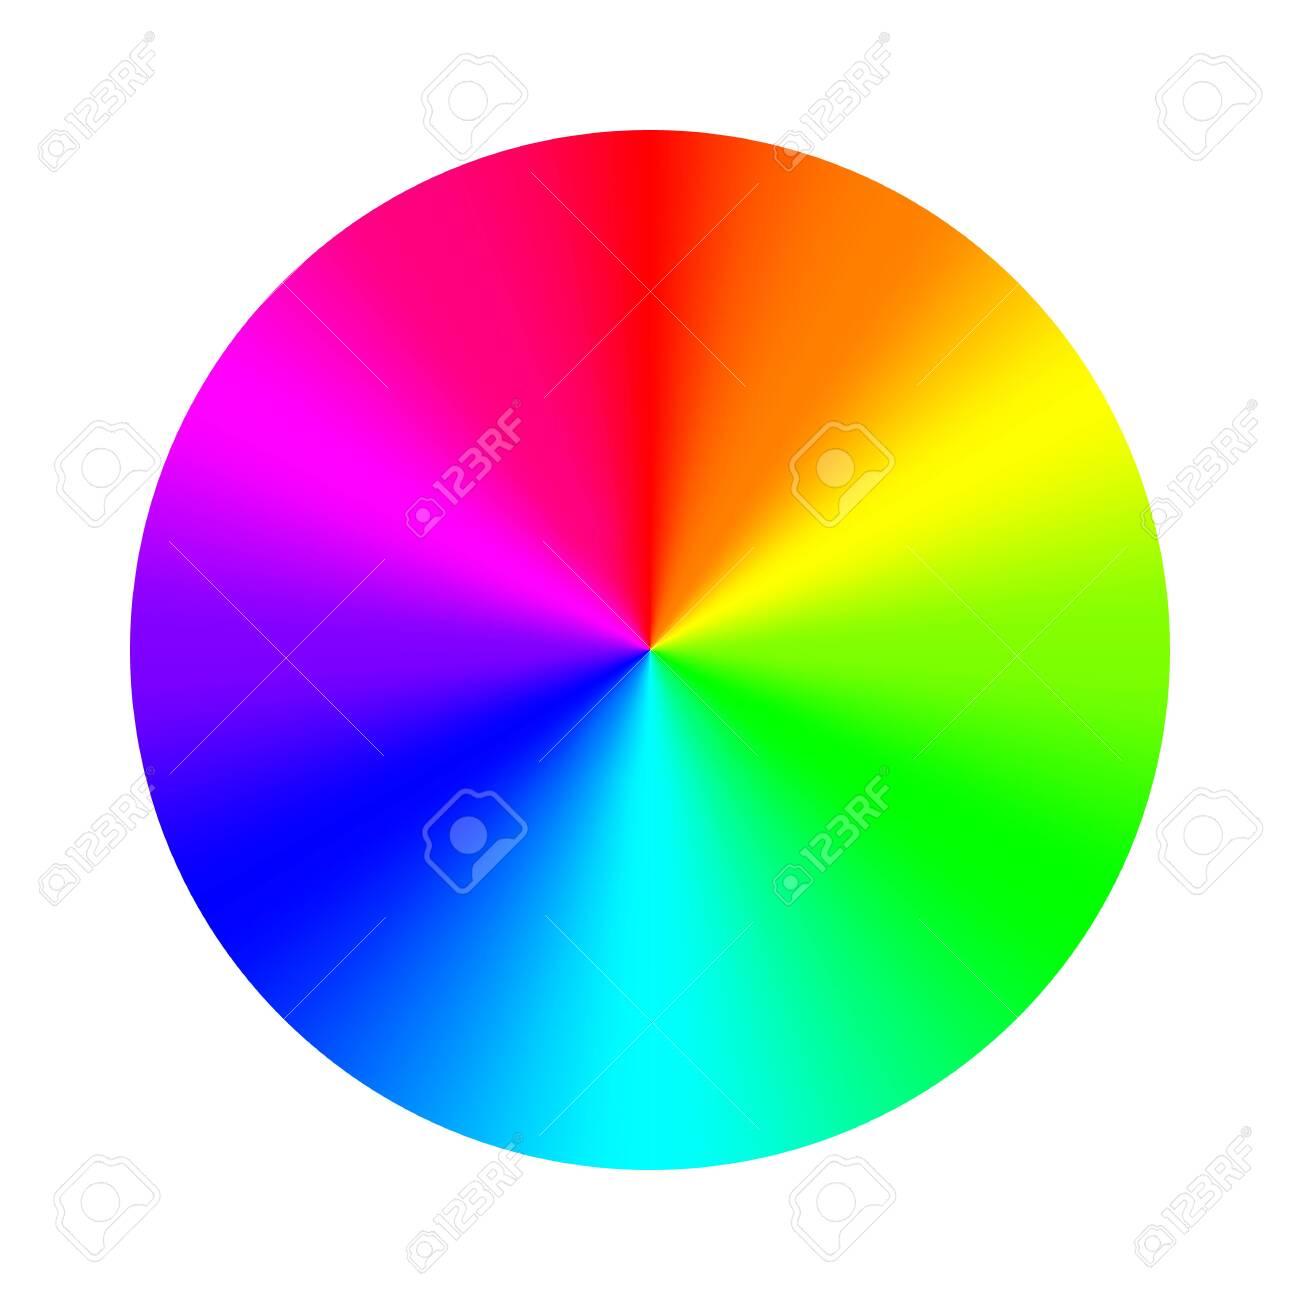 Color wheel palette. RGB, RYB, CYMK system. Color harmony. Vector Illustration. - 142029542